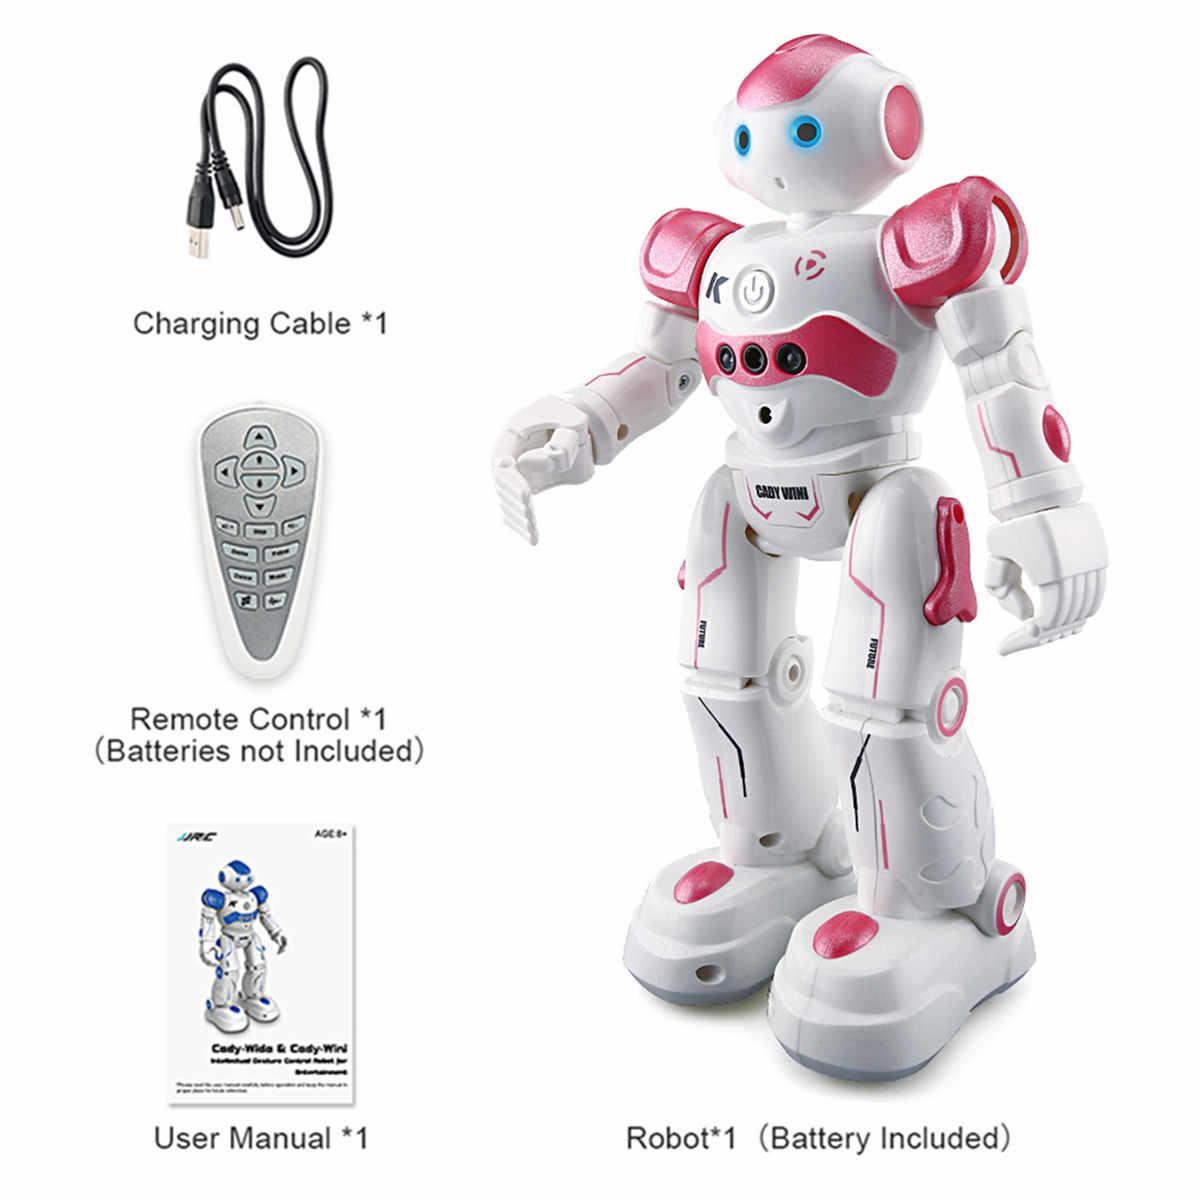 LEORY RC 로봇 지능형 프로그래밍 원격 제어 Robotica 장난감 Biped 휴머노이드 로봇 어린이를위한 생일 선물